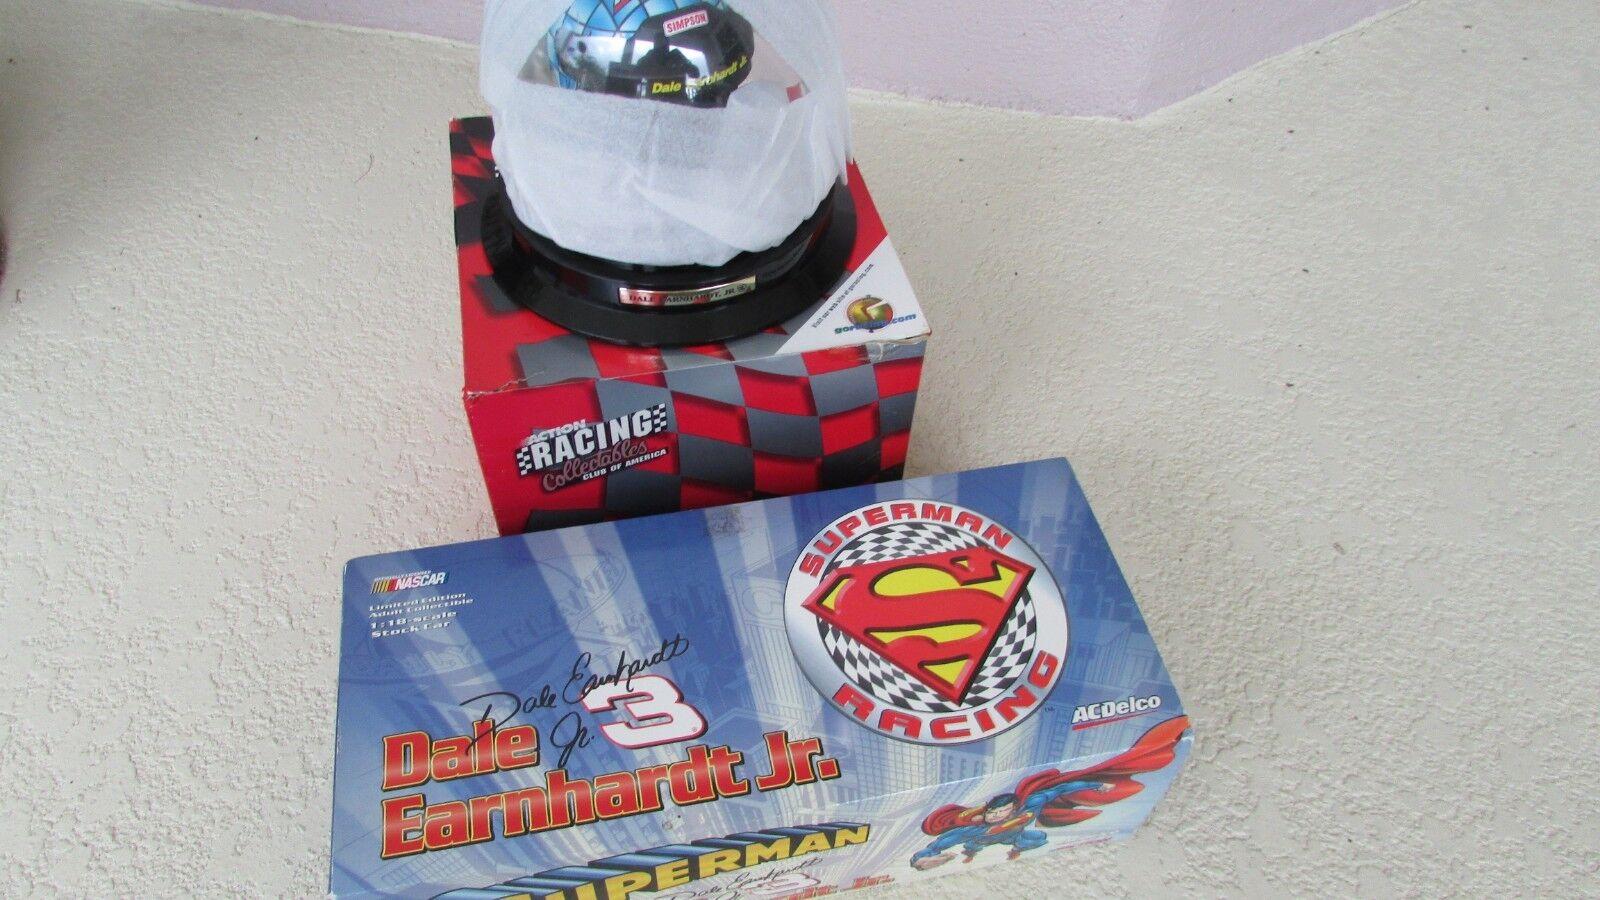 1 18 Dale Earnhardt Jr AC Delco Superman race car 1999 Monte Carlo Spl helmet